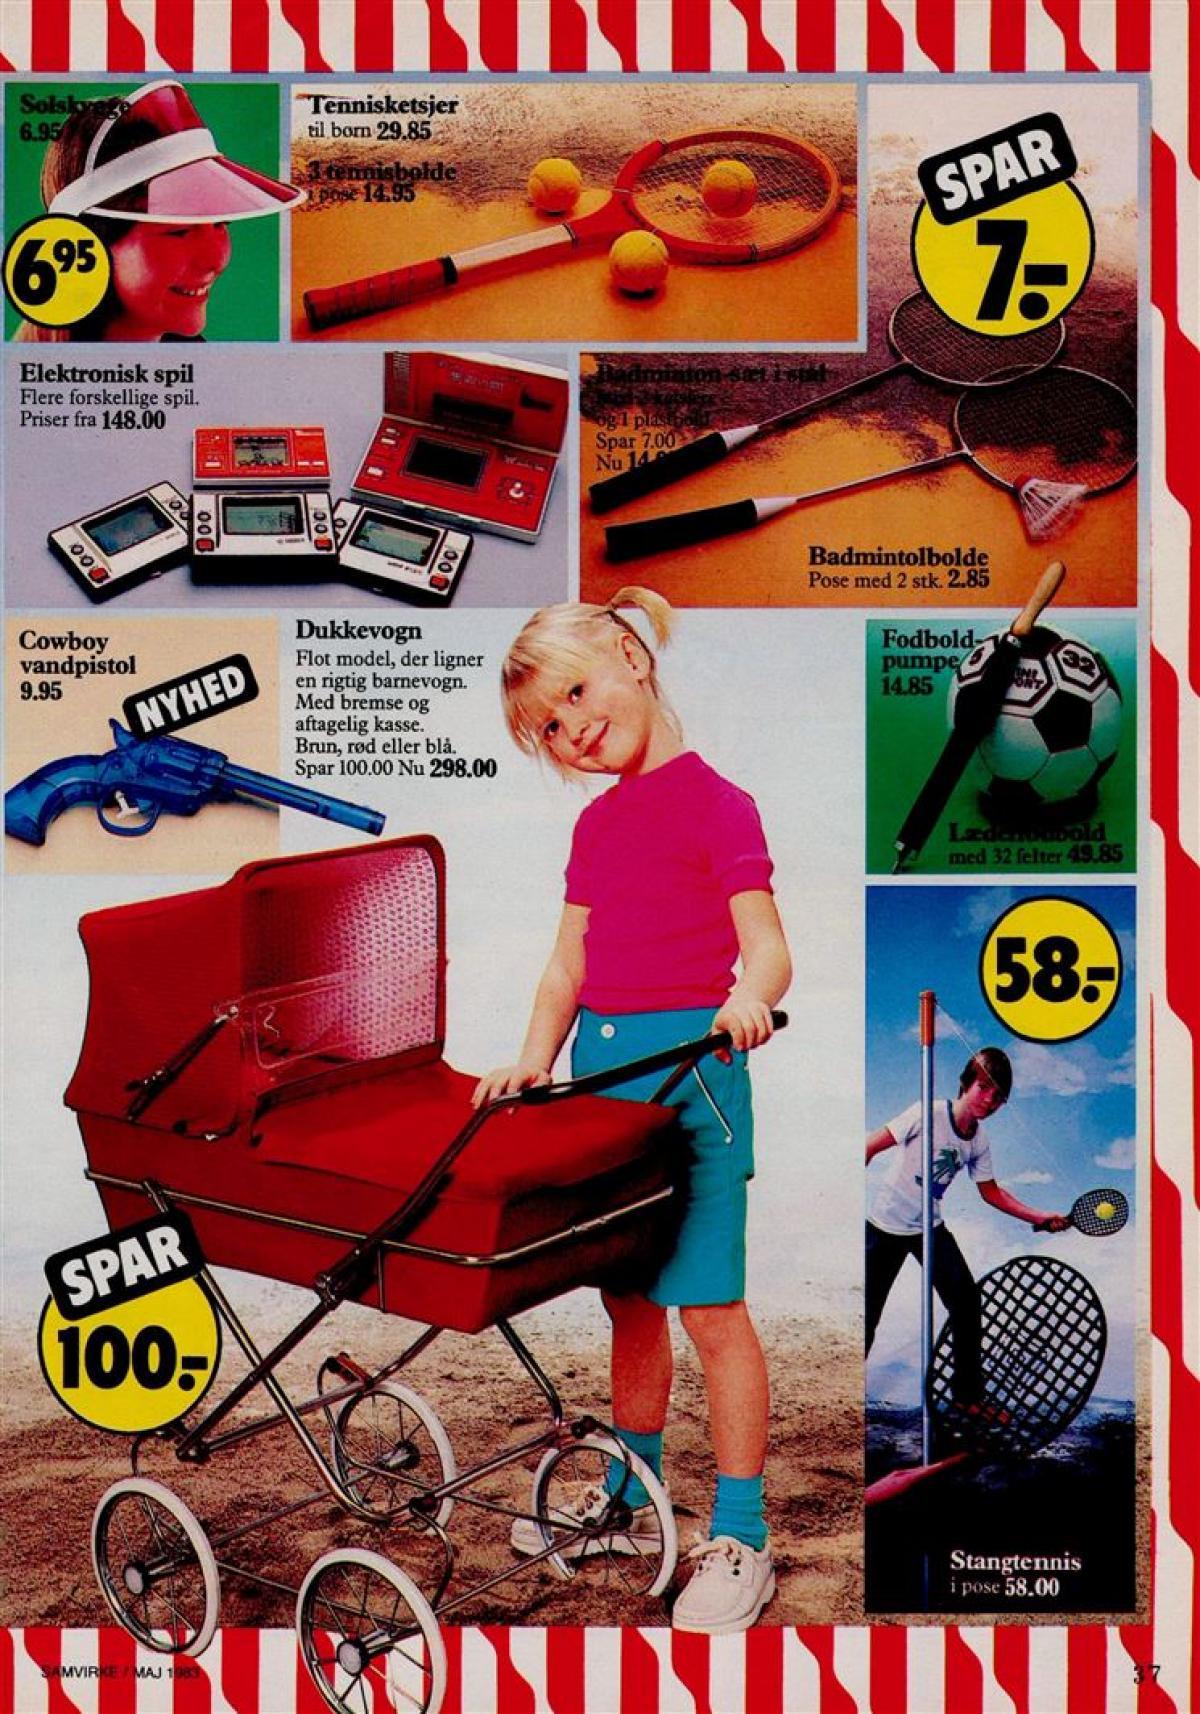 legetøj i kvickly